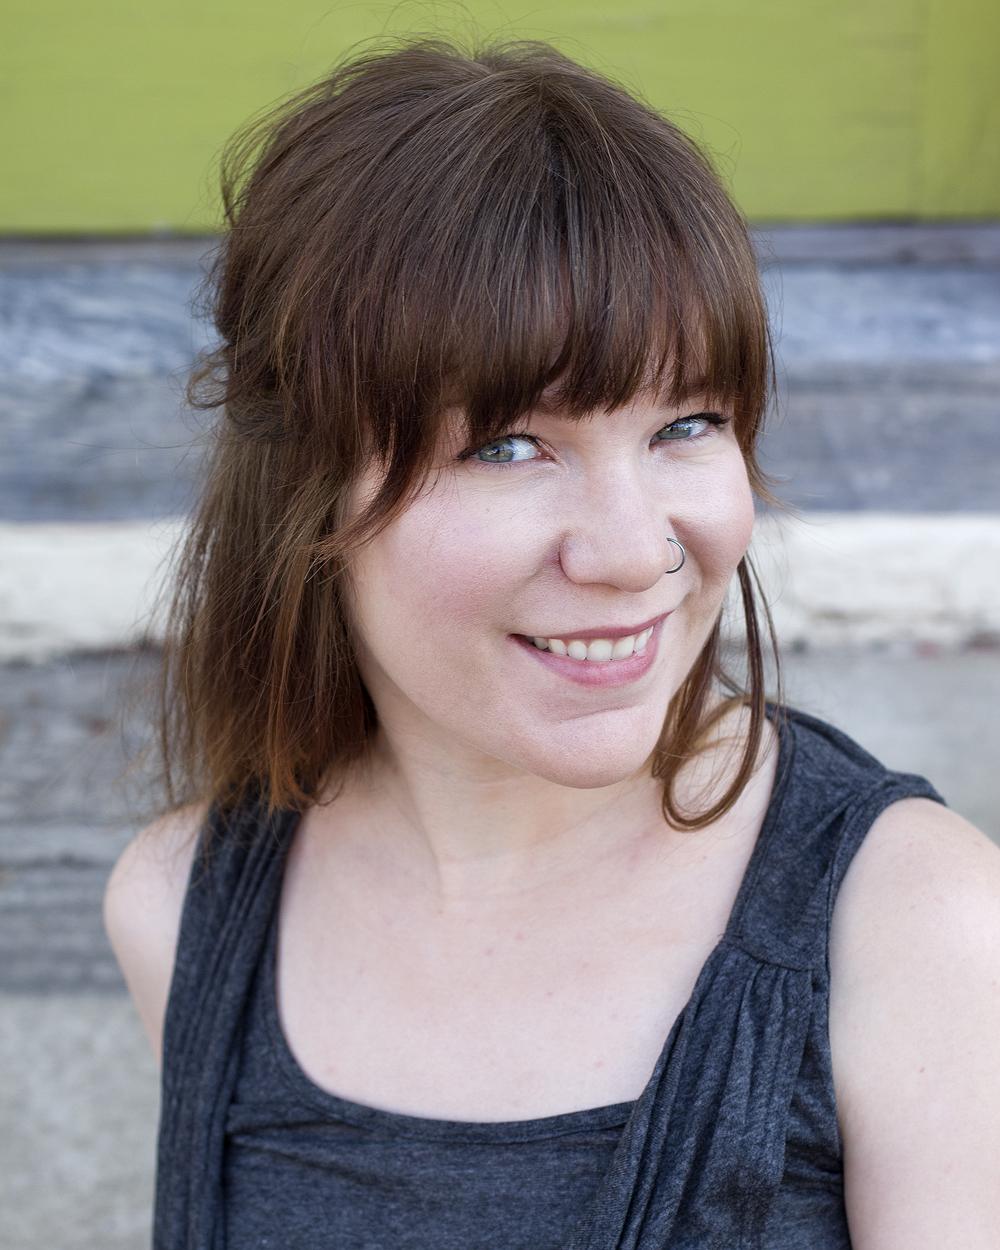 Chrissy NIckel  - Newsboy